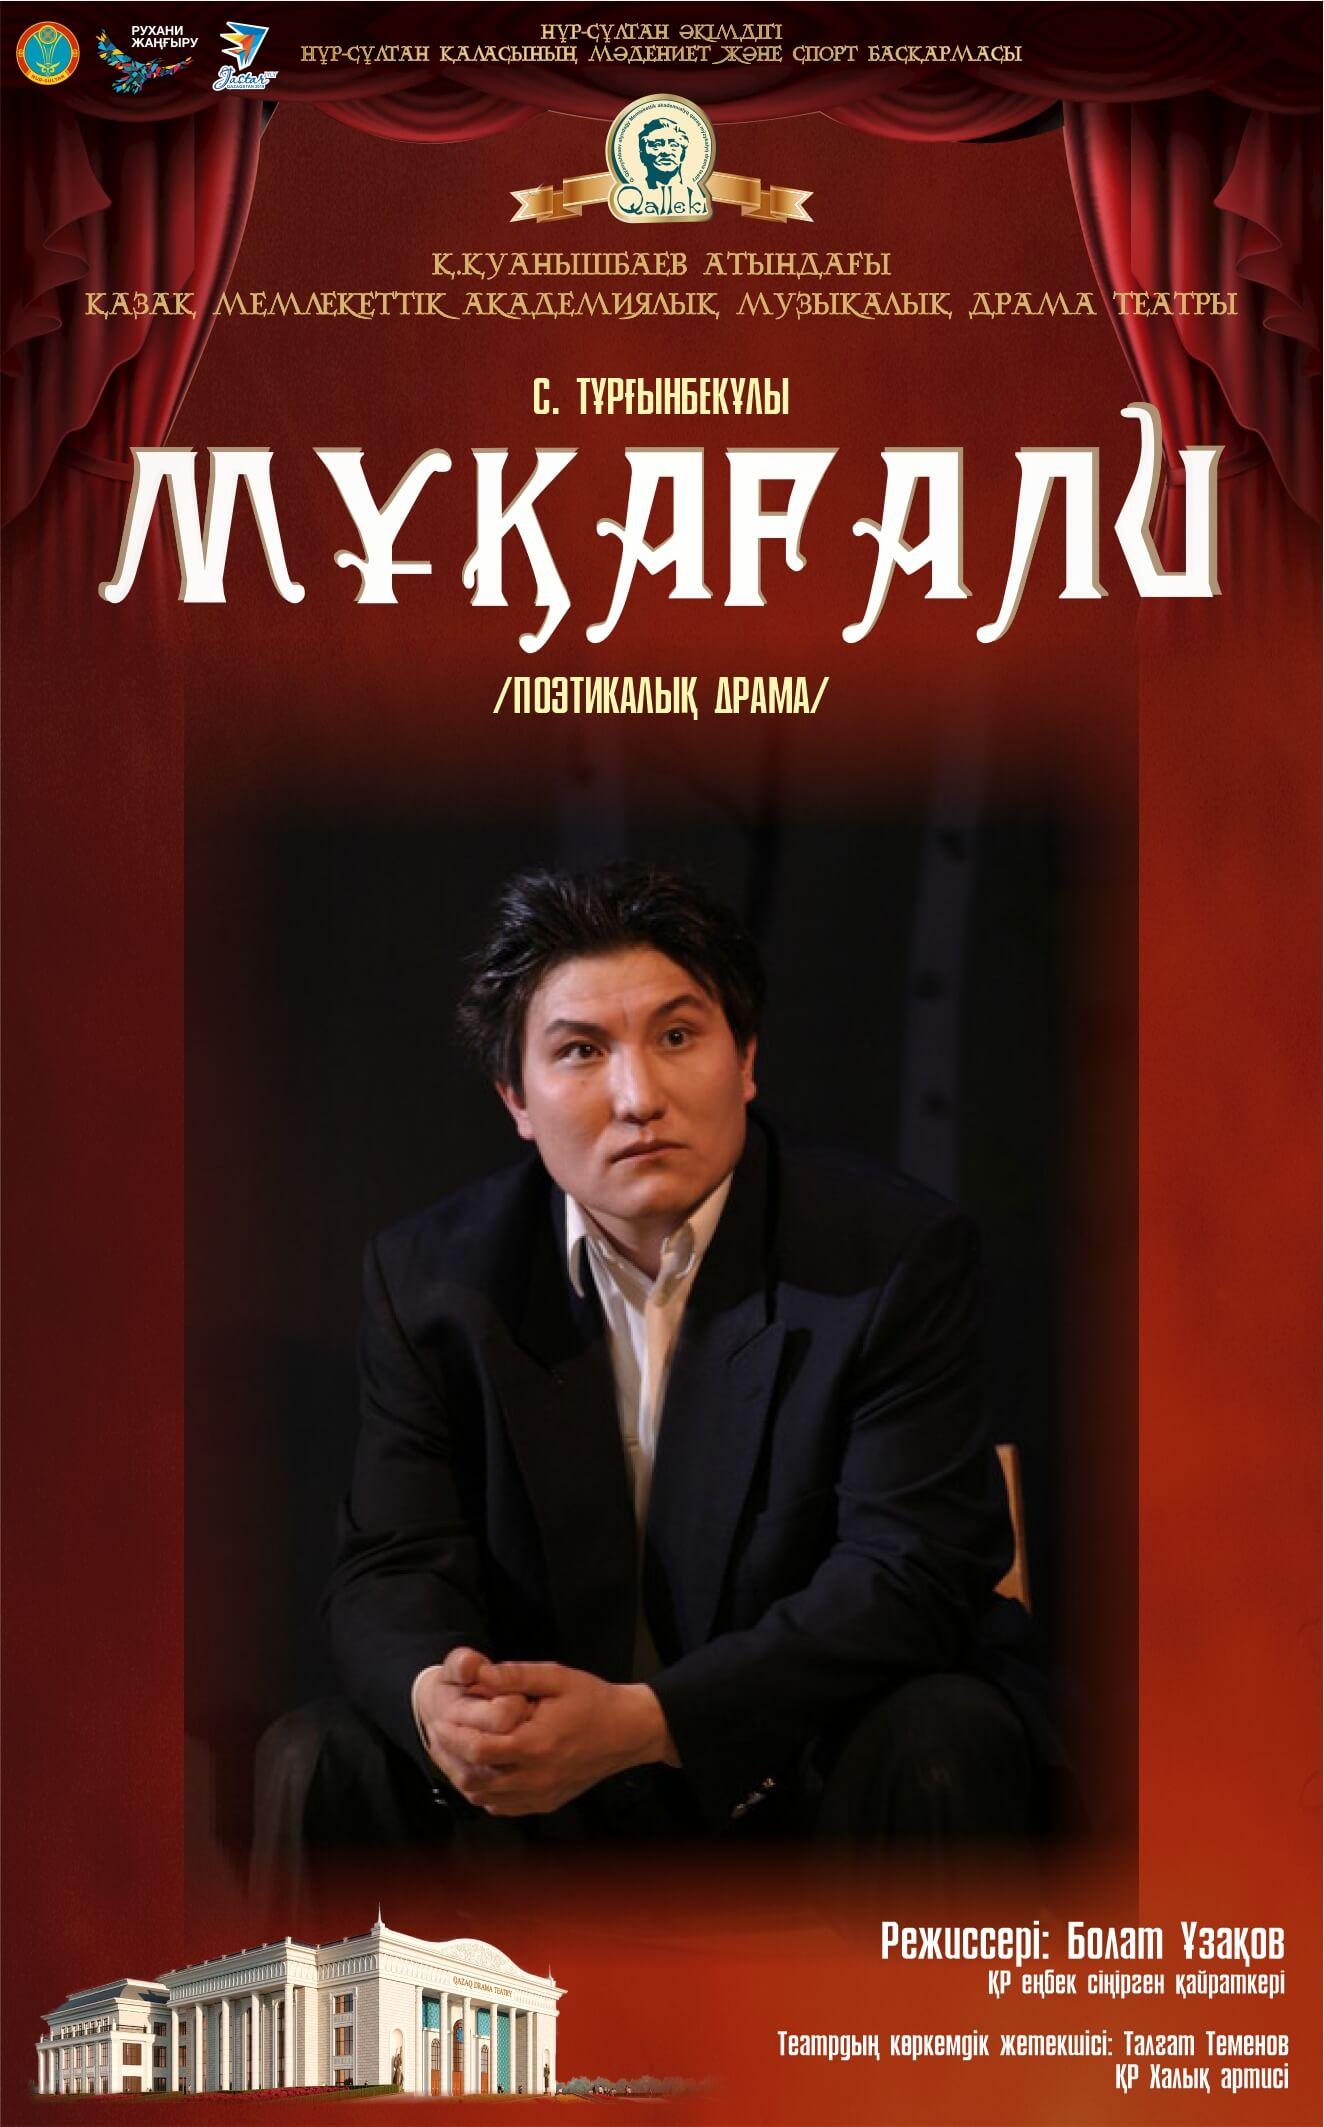 Мұқағали/ Театр им. К. Куанышбаева